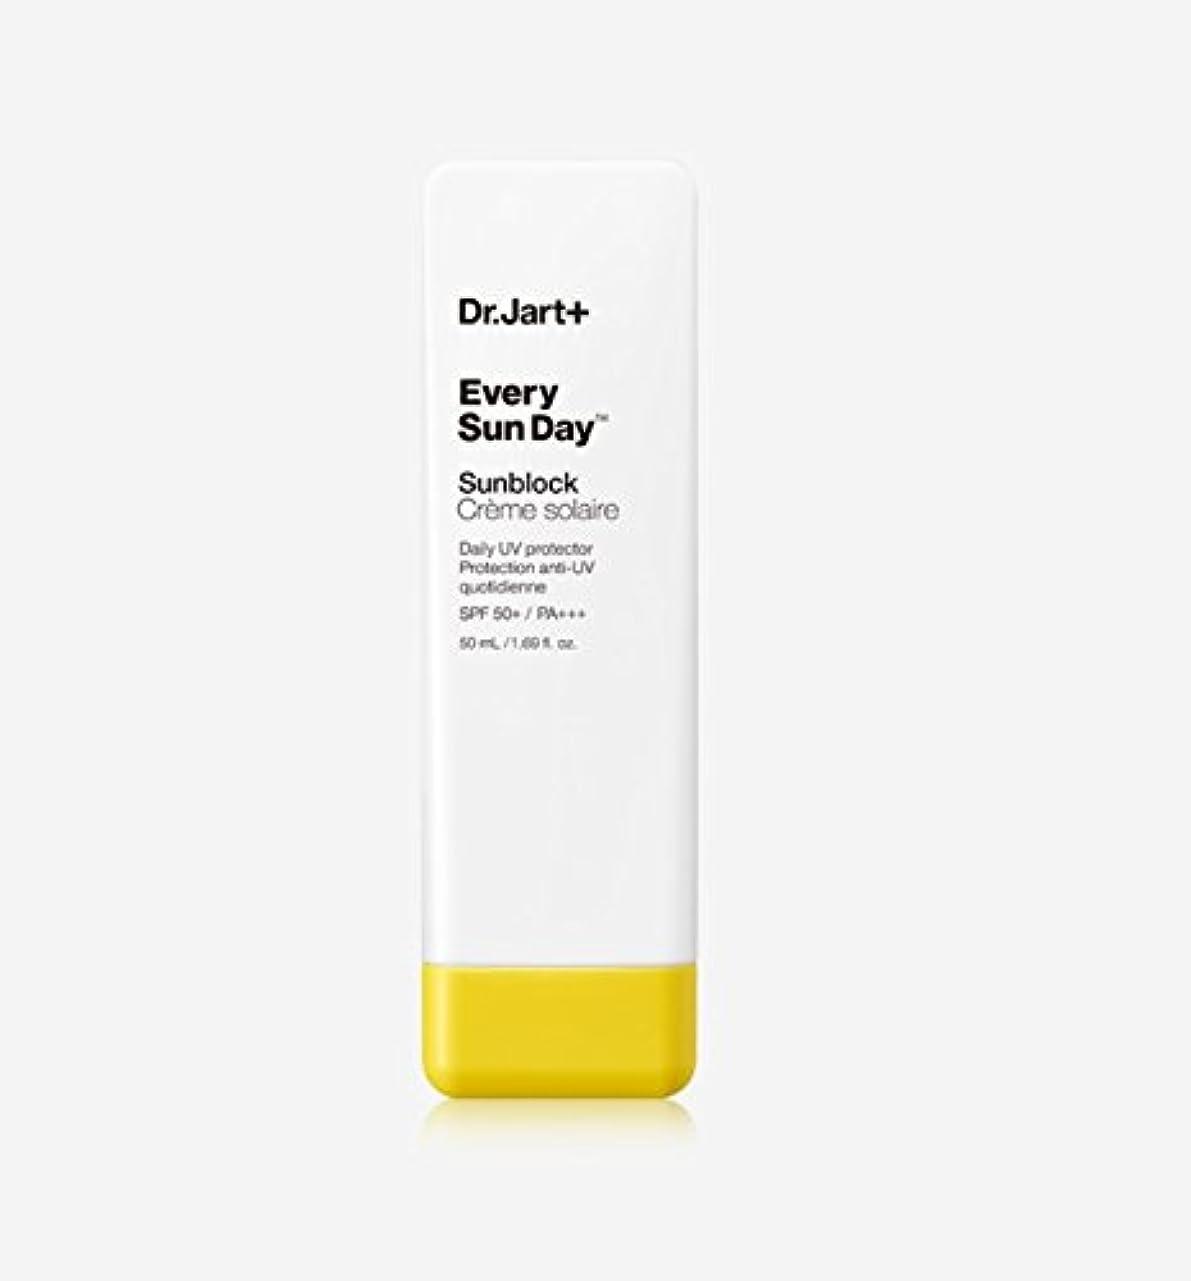 [Dr.Jart+] NEW ドクタージャルト エヴリ サンデー サンブロック 50ml スキントーン クリーム タイプ SPF50+ PA+++ / NEW Every Sun Day Sunblock [並行輸入品]